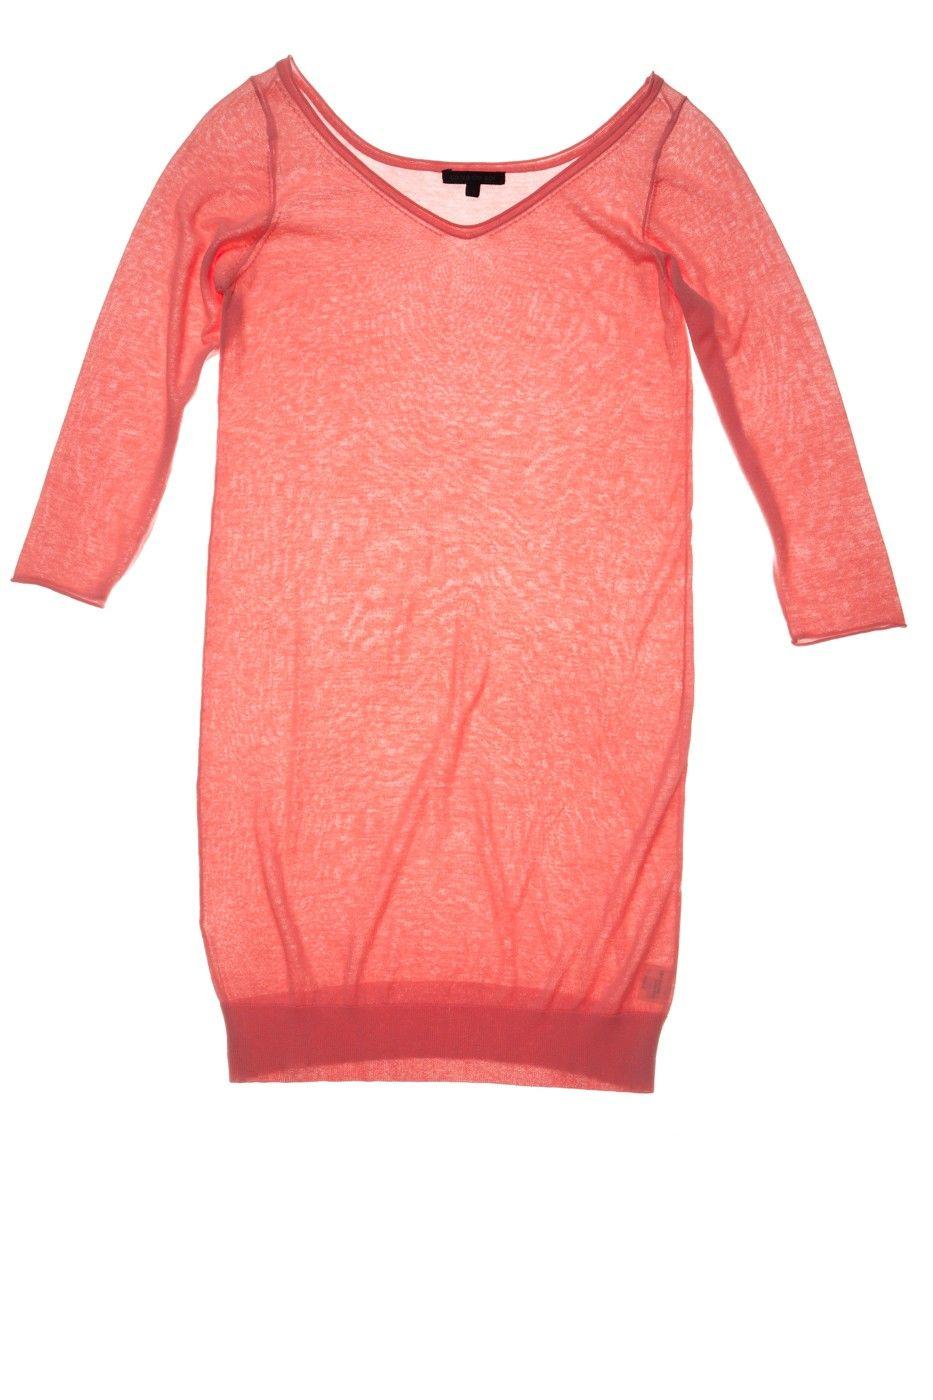 ça va de soi - Chloe, robe coton crêpe Artic™, cupcake, Femme | ça va de soi - #cavadesoi #dress #classic #cotton #egyptiancotton #sustainable #sustainablefashion #summer #summeroutfit #summerclassic #pink #vneck #montreal #canadian #fashion